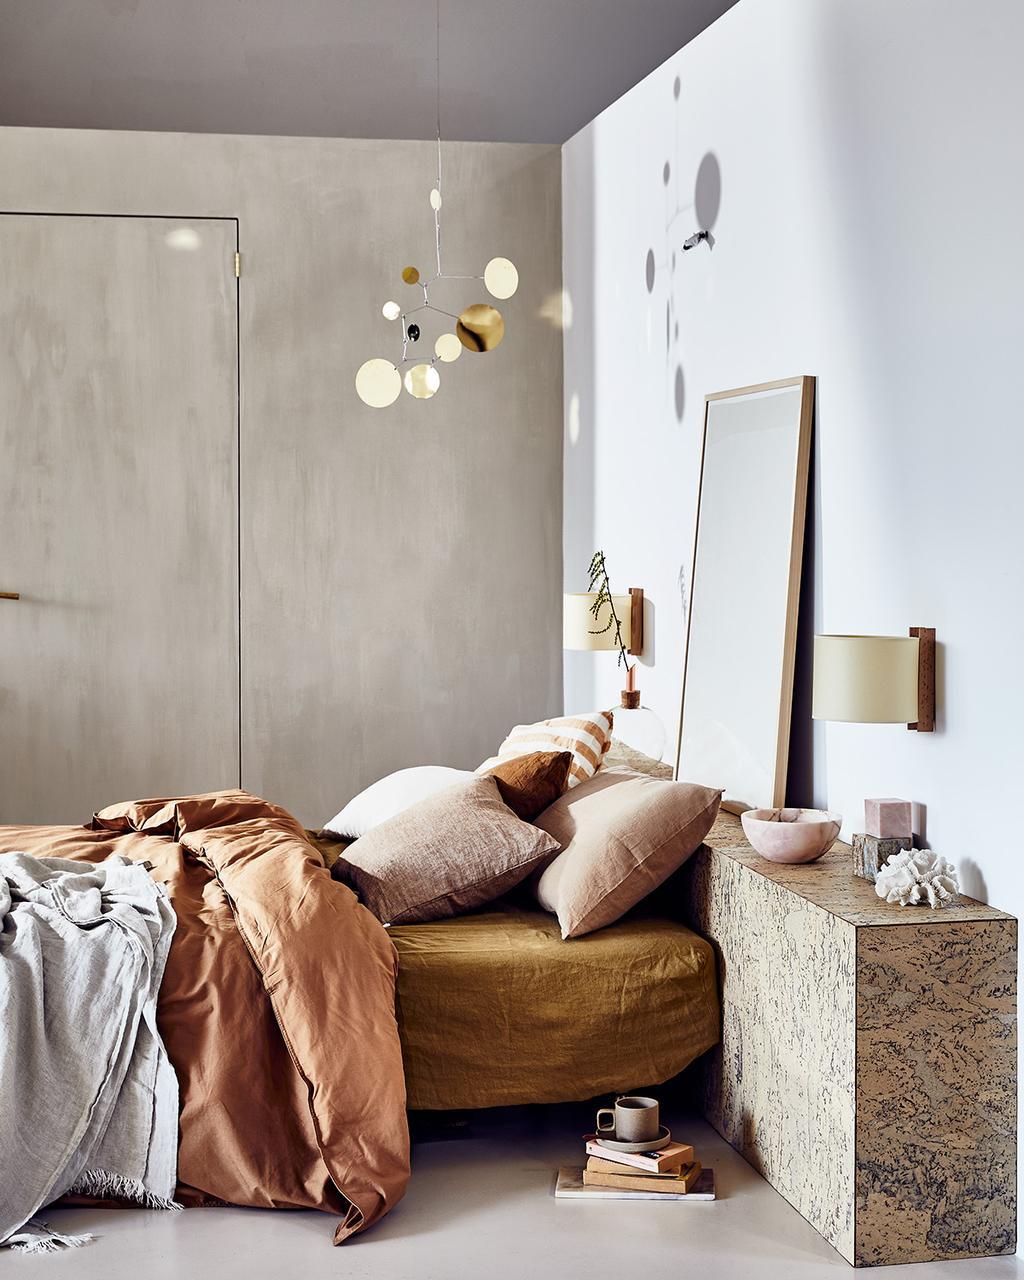 vtwonen editie 5 styling ecologisch slaapkamer